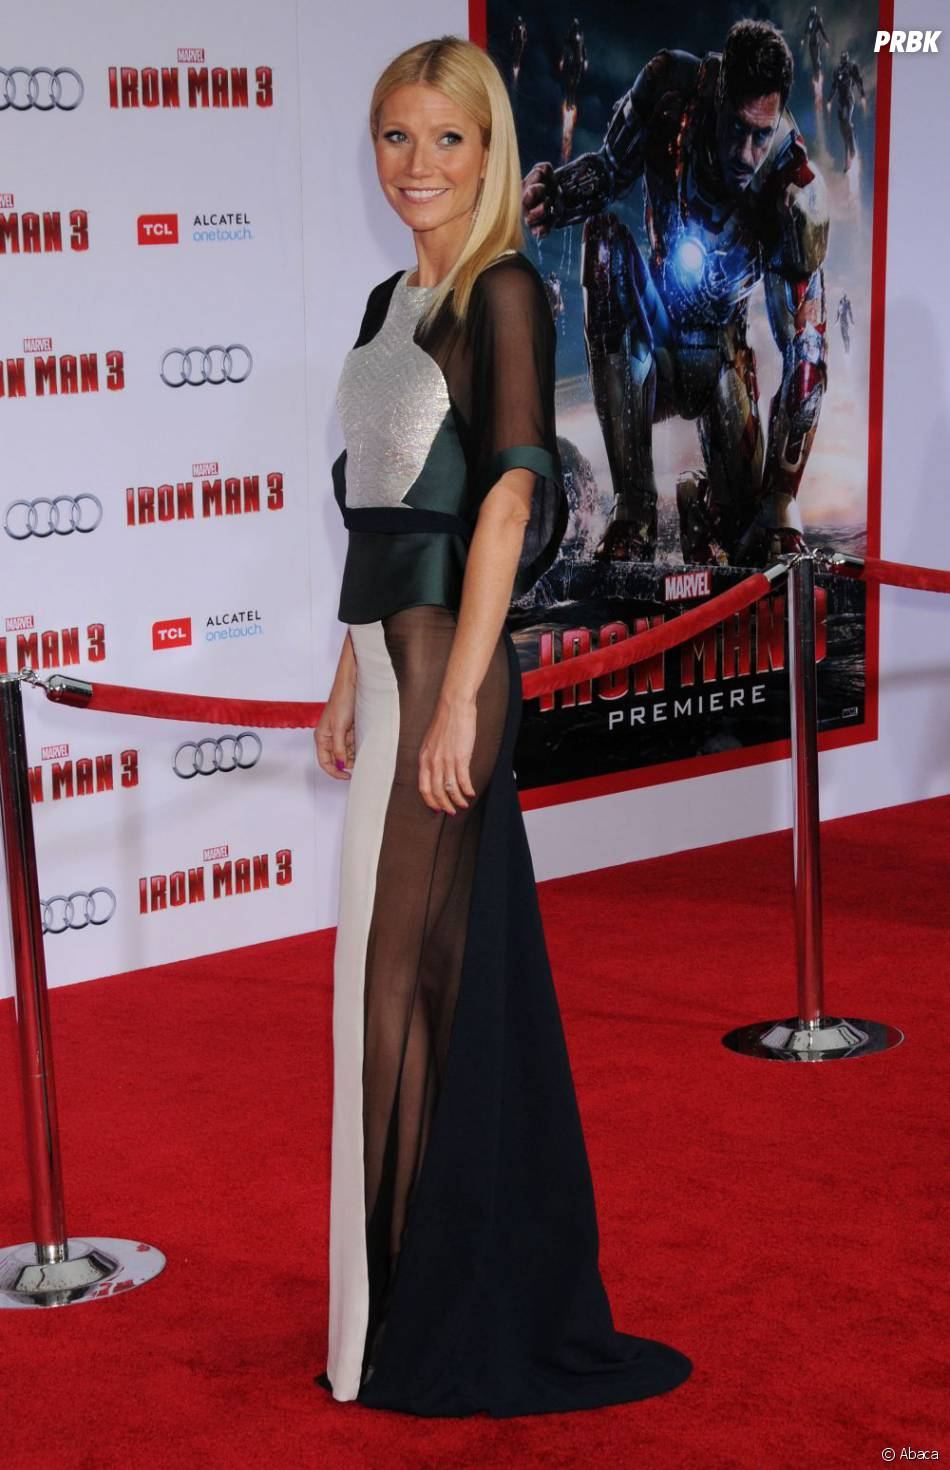 Gwyneth Paltrow veut garder son statut de plus belle femme du monde